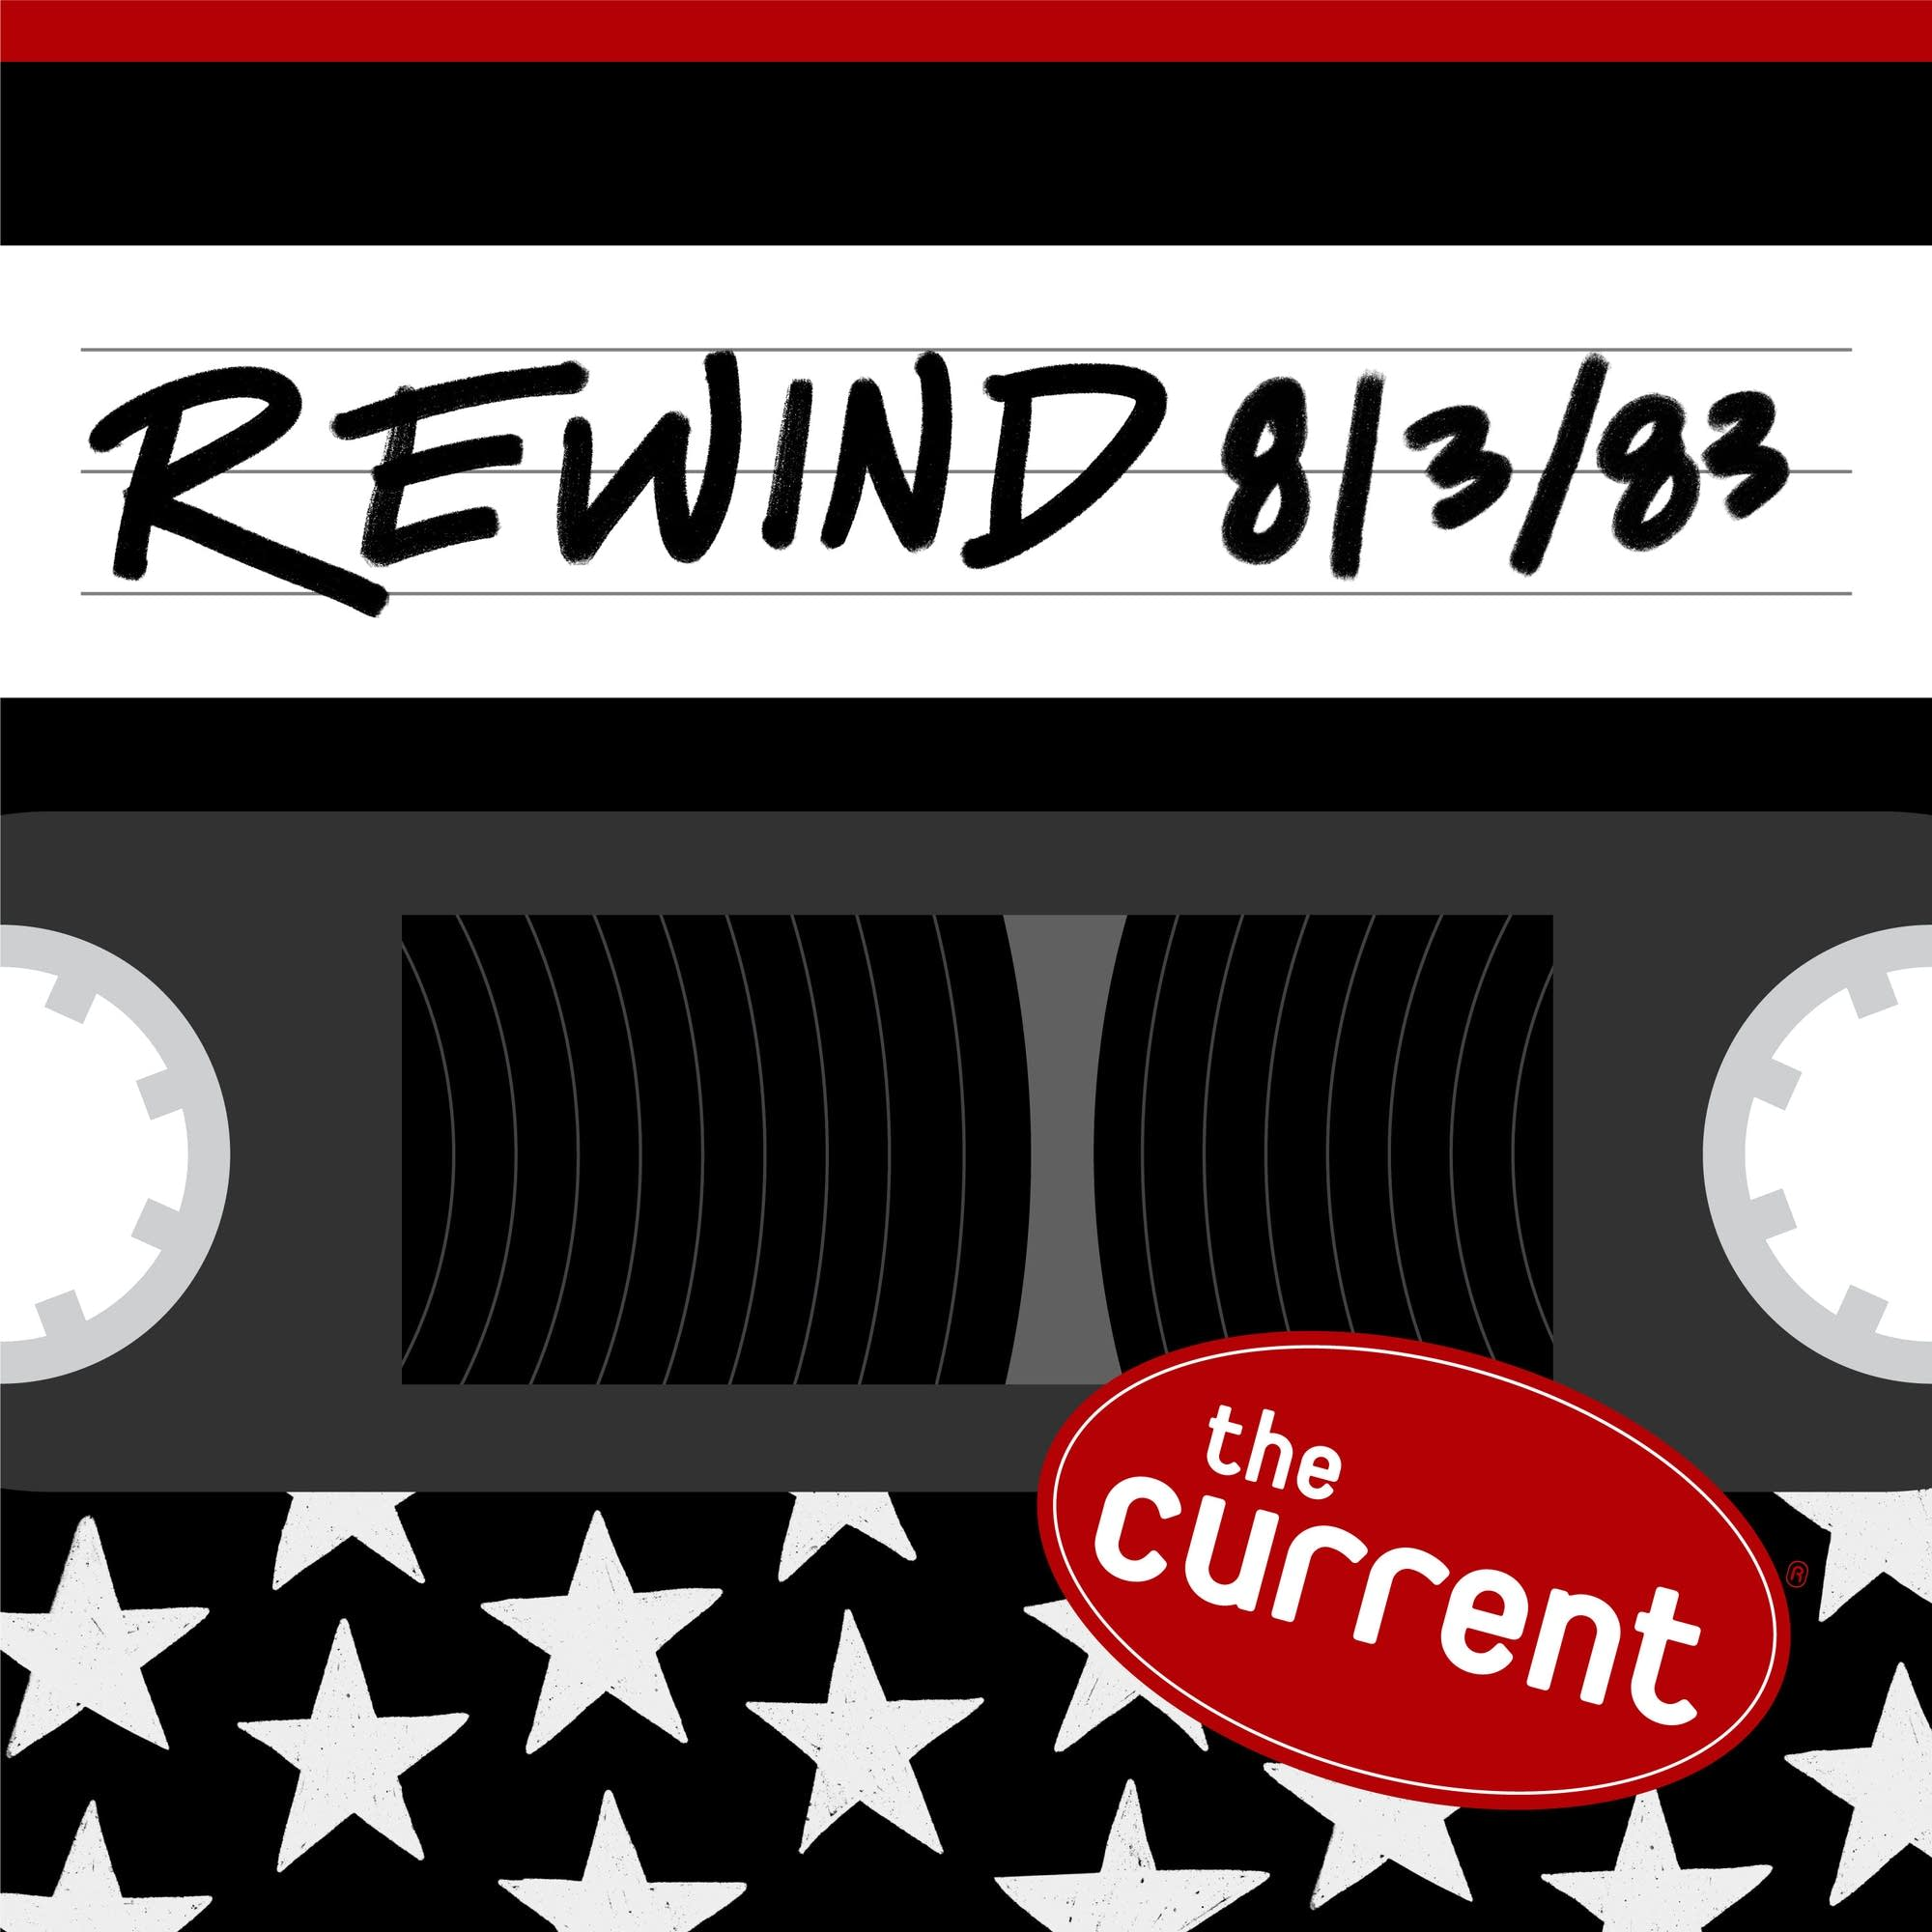 The Current Rewind: 8/3/83